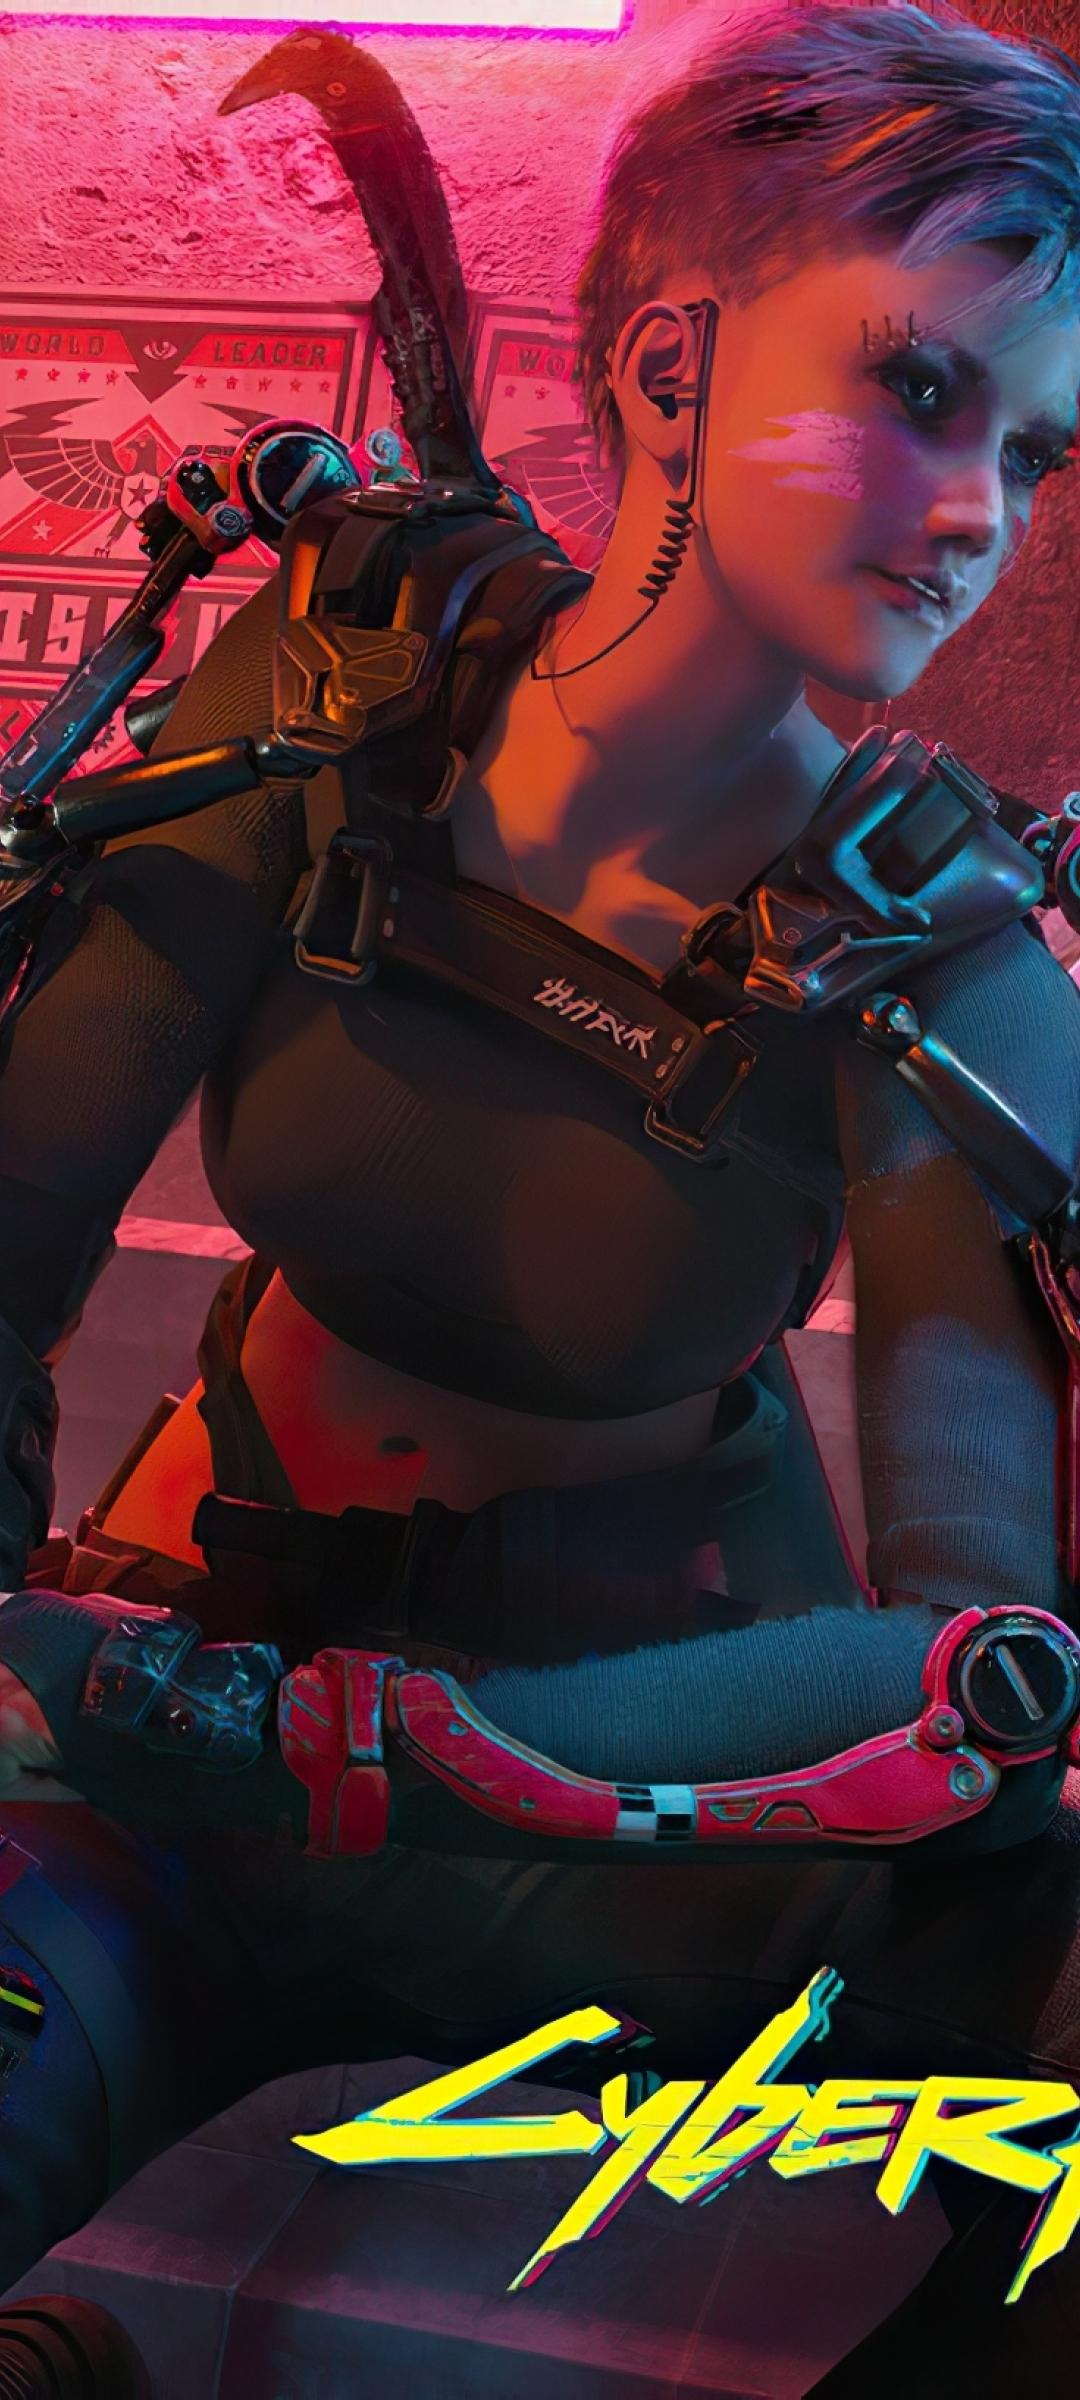 1080x2400 Cyberpunk 2077 Girl Team 1080x2400 Resolution ...